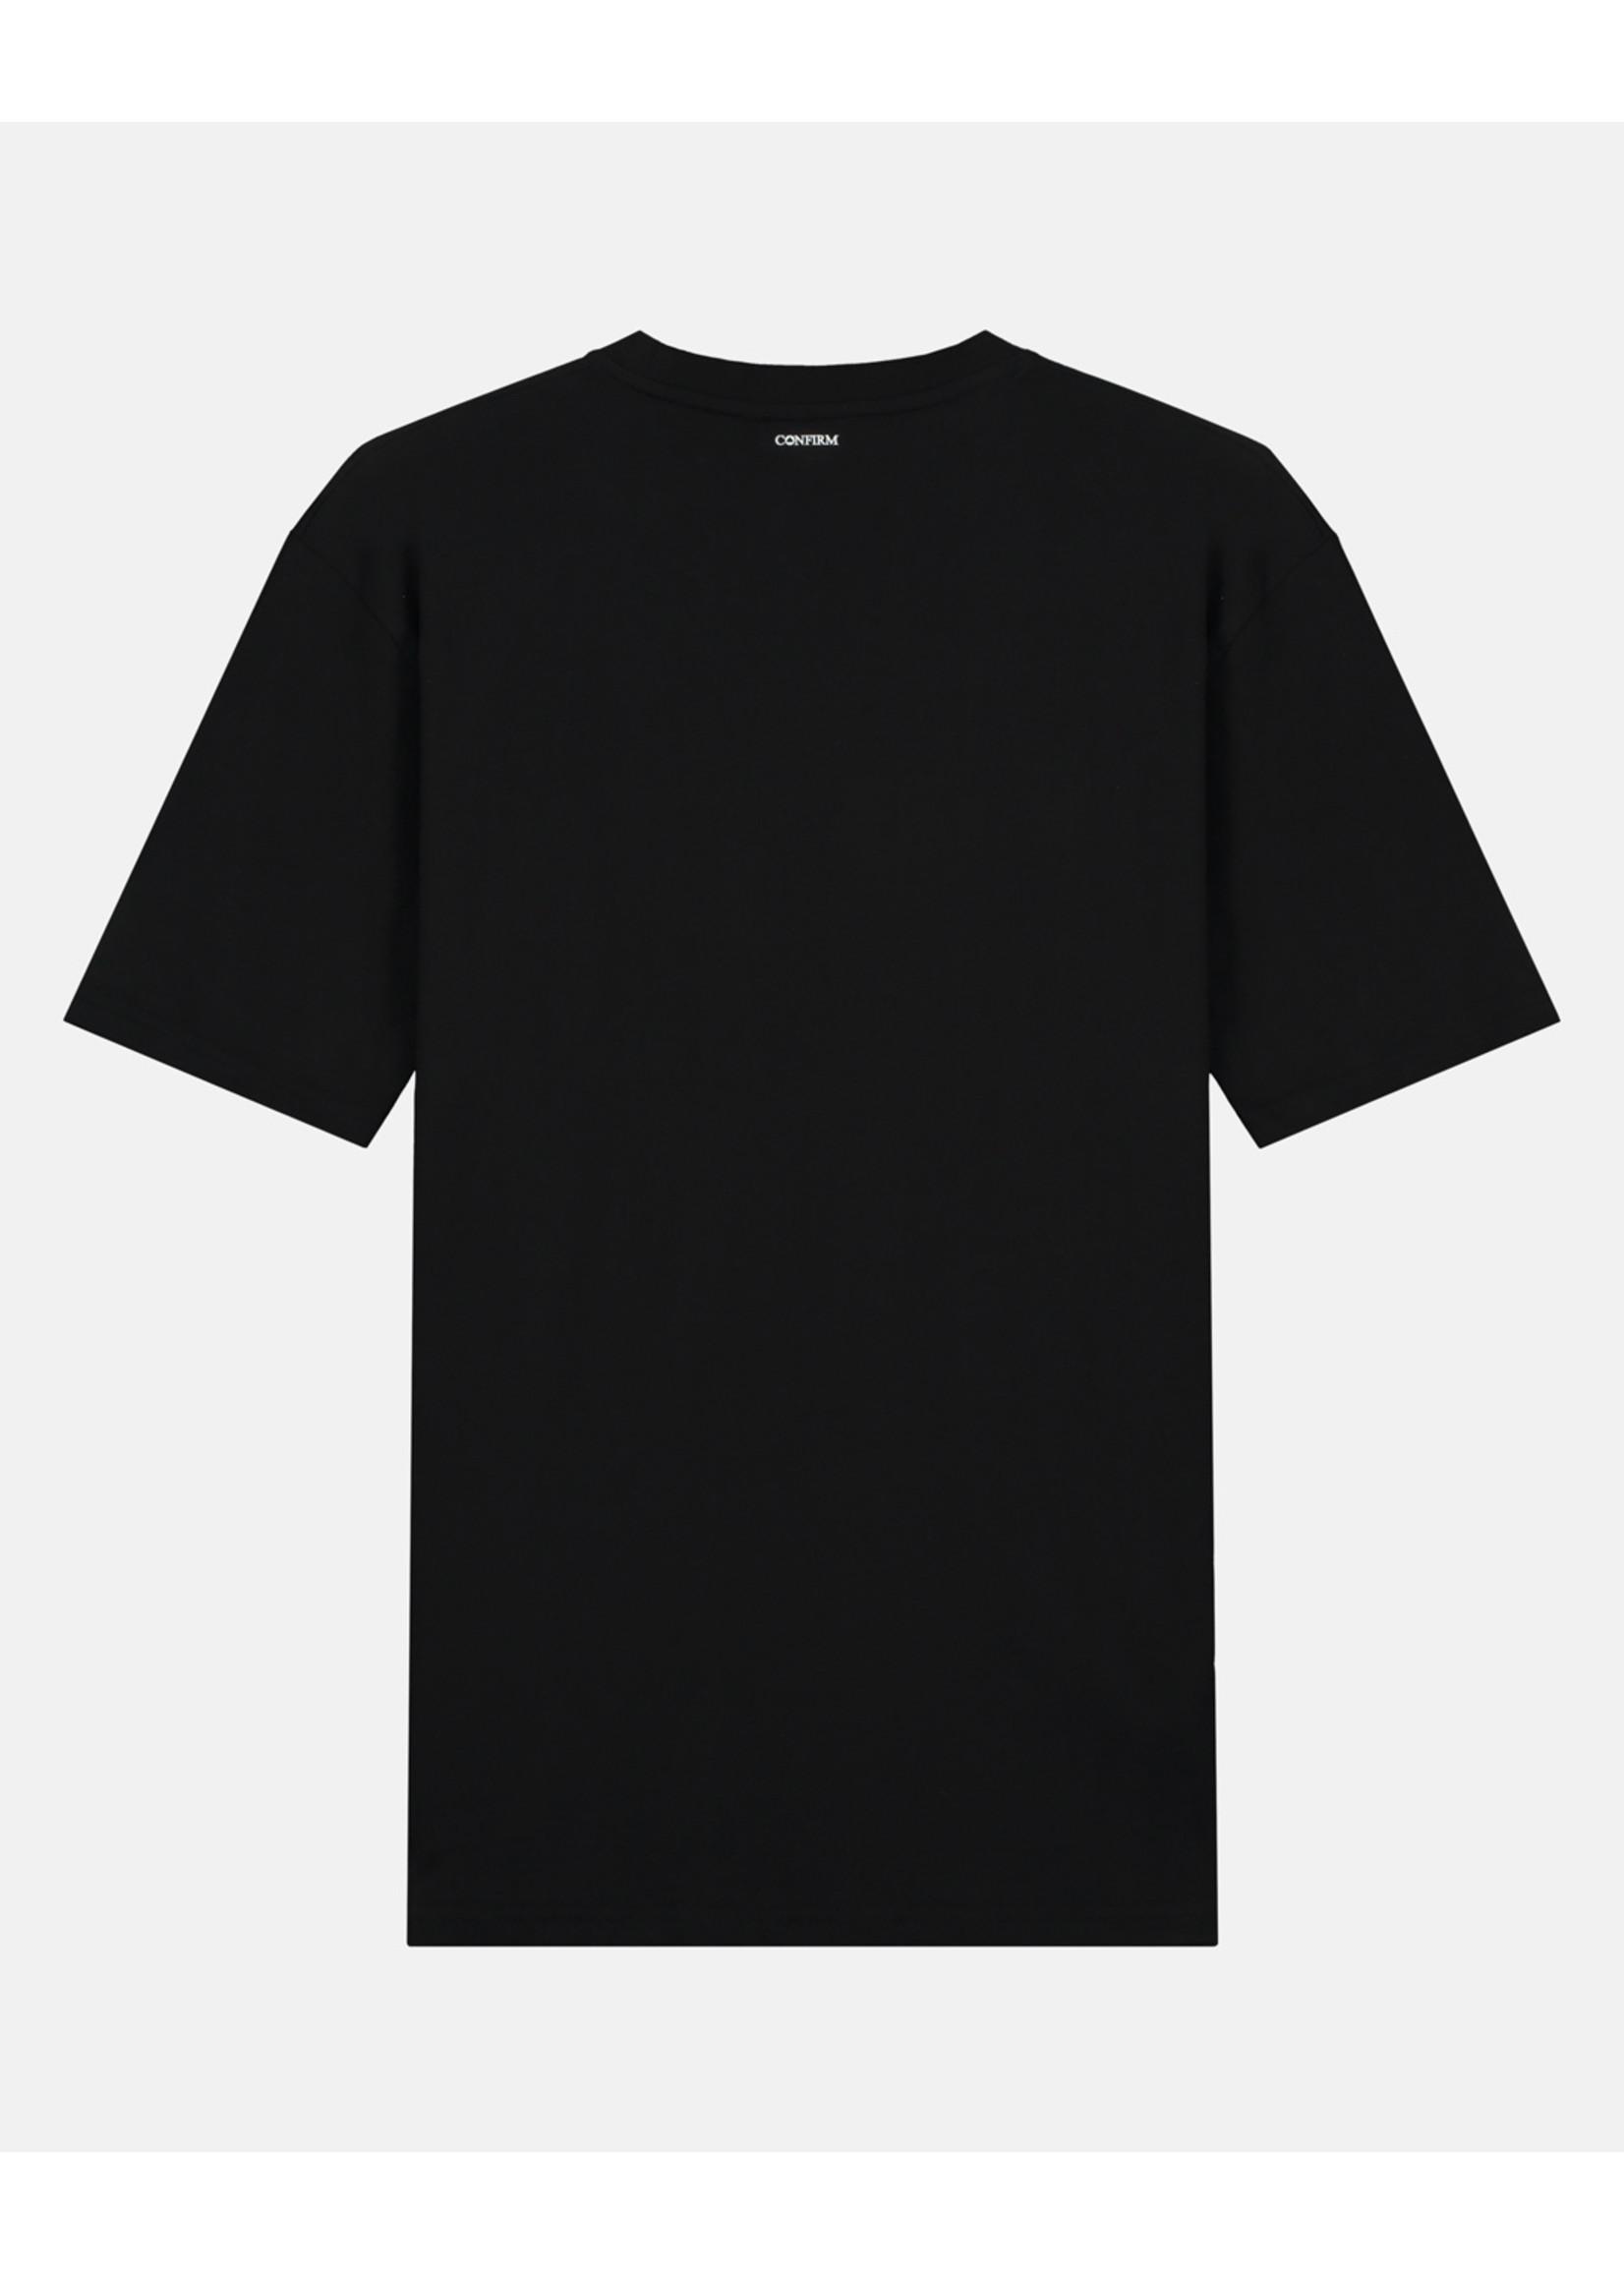 Confirm brand T-shirt identity subtle - neon yellow